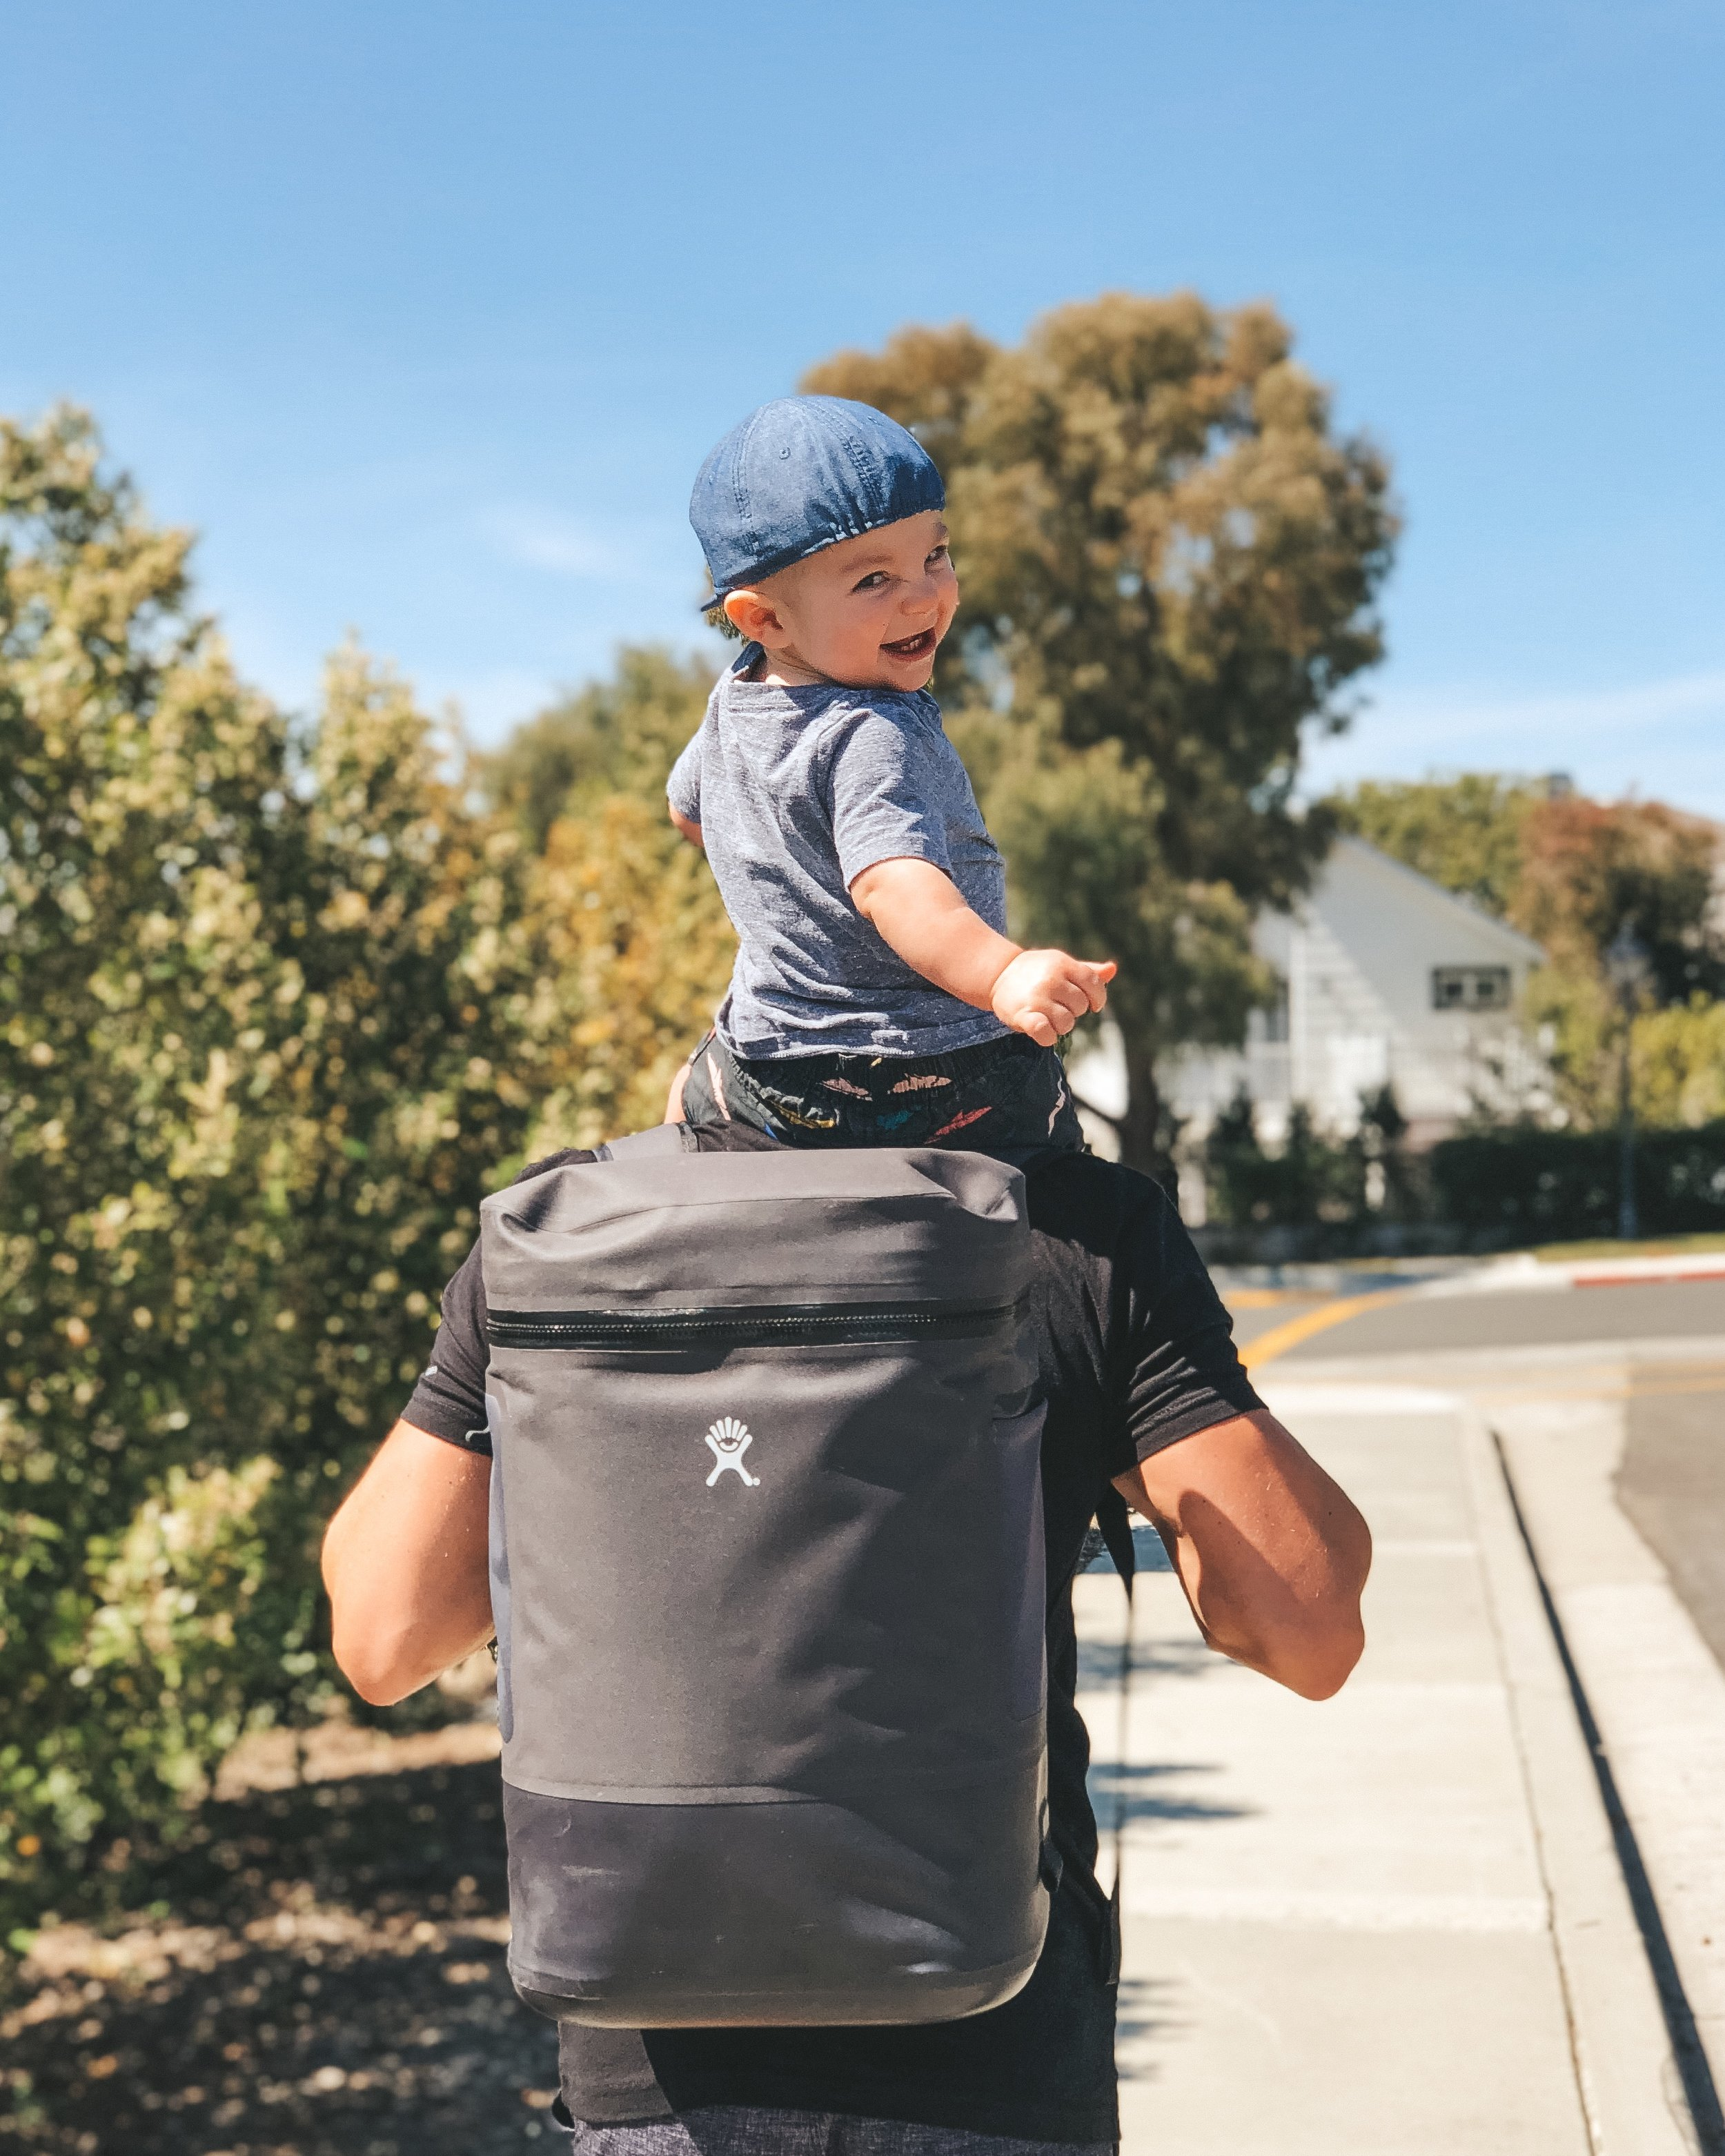 Jett Jones 11 Month Milestones.  Cute baby boy clothes.  Hydroflask cooler backpack.